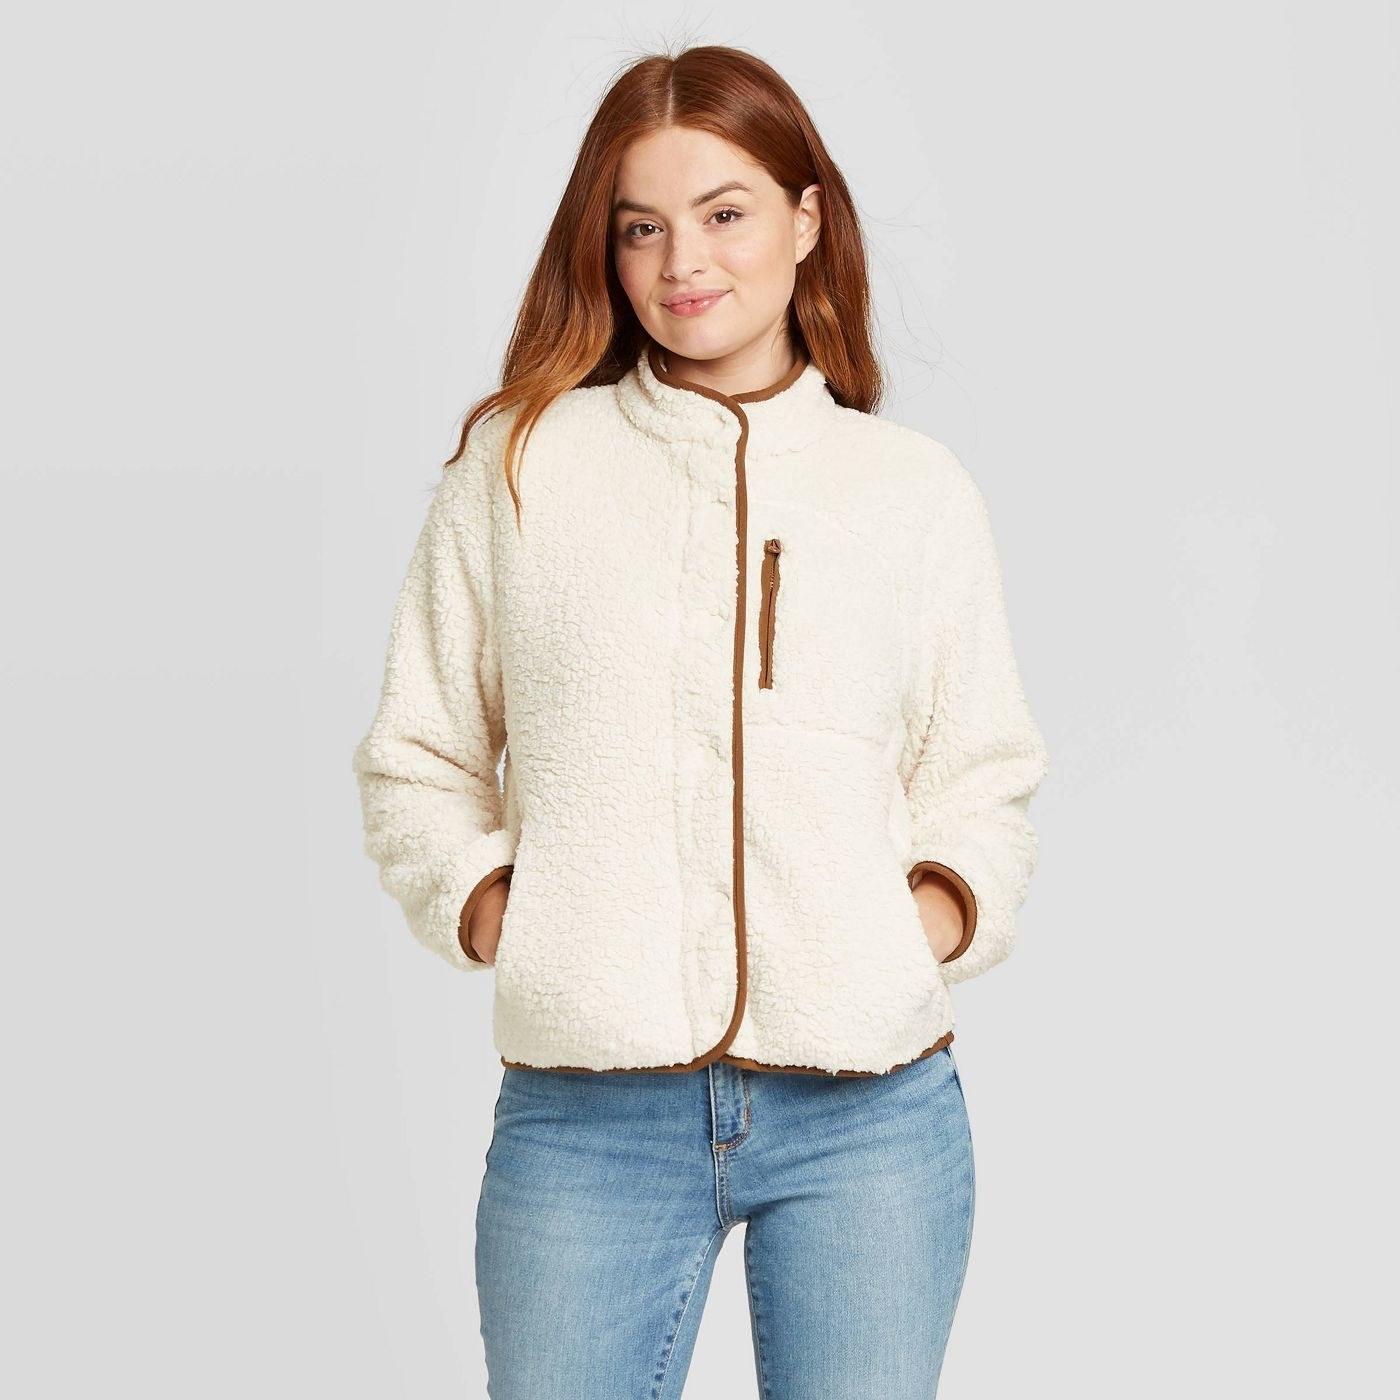 Model wearing the cream brown jacket